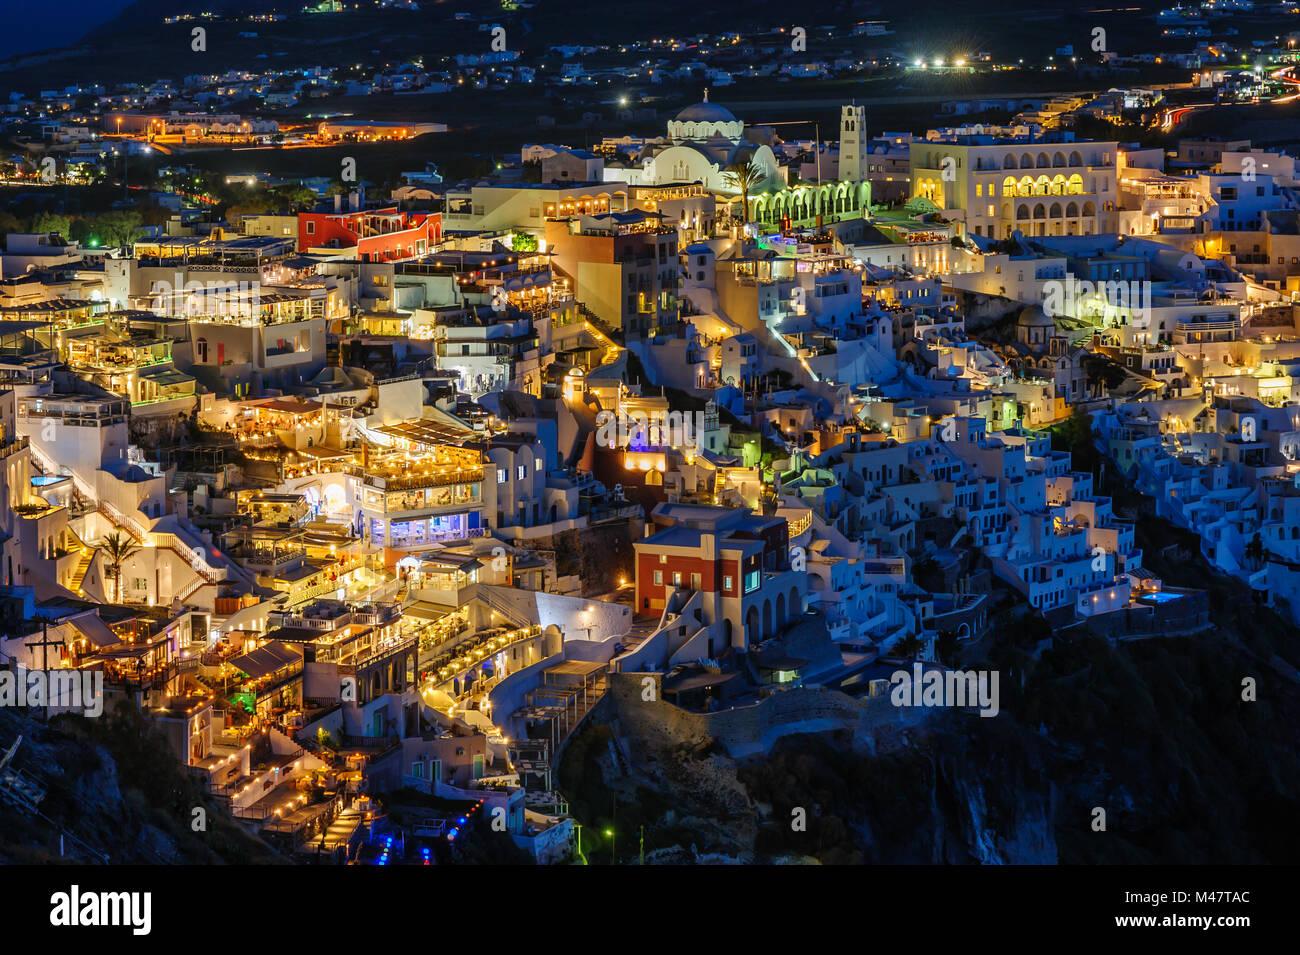 Fira luxury decks and patios at night Stock Photo